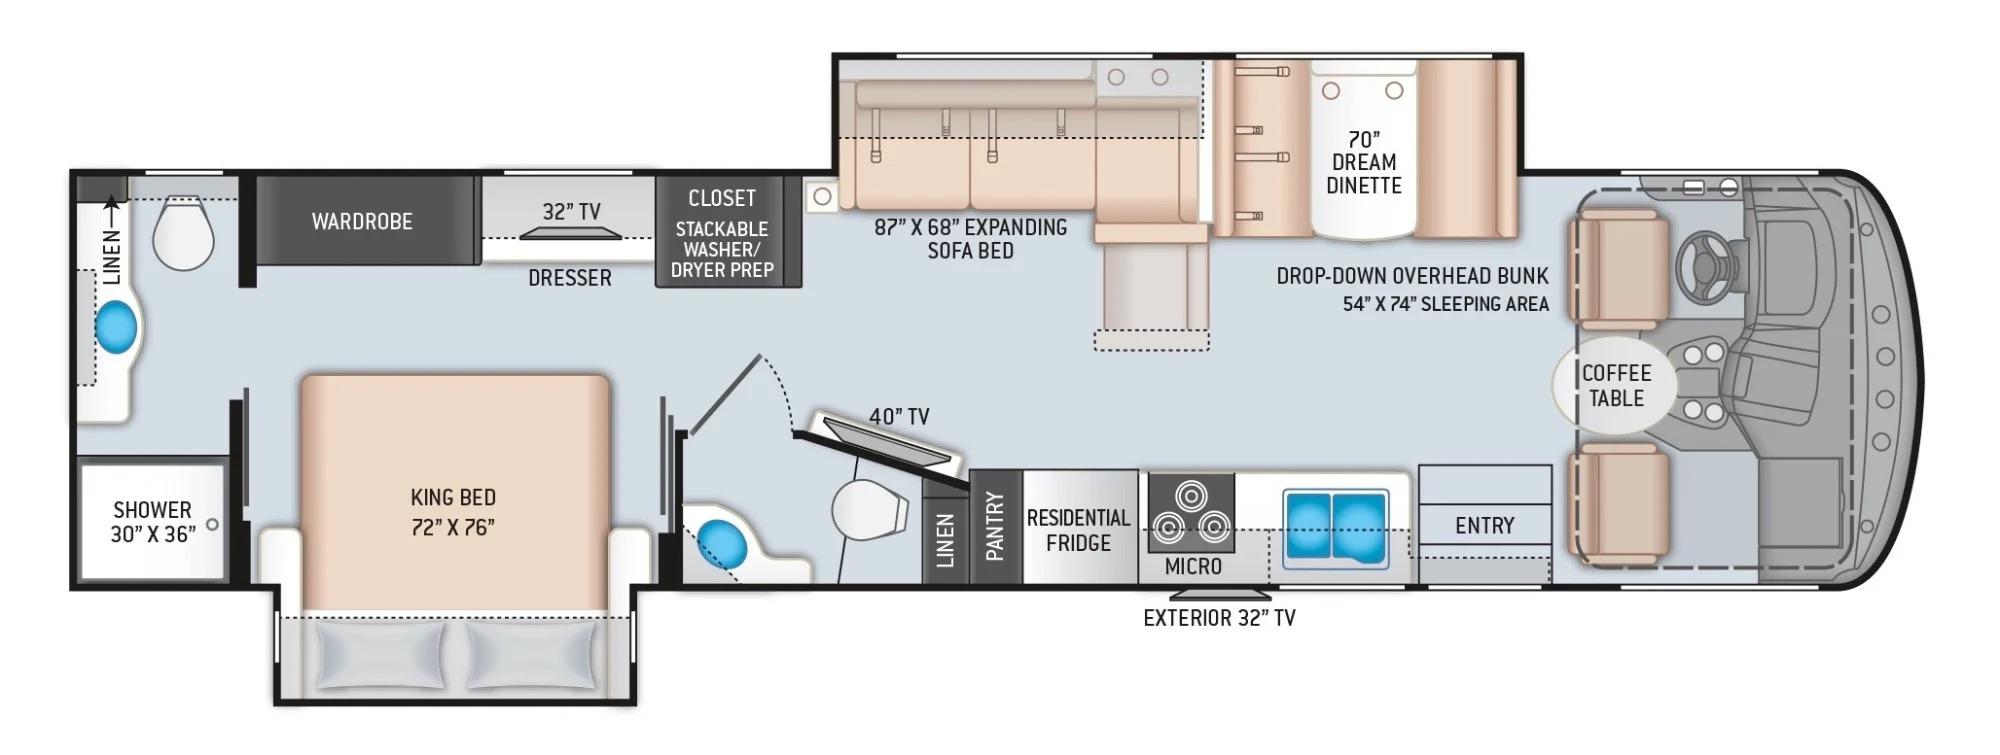 View Floor Plan for 2022 THOR HURRICANE 35M